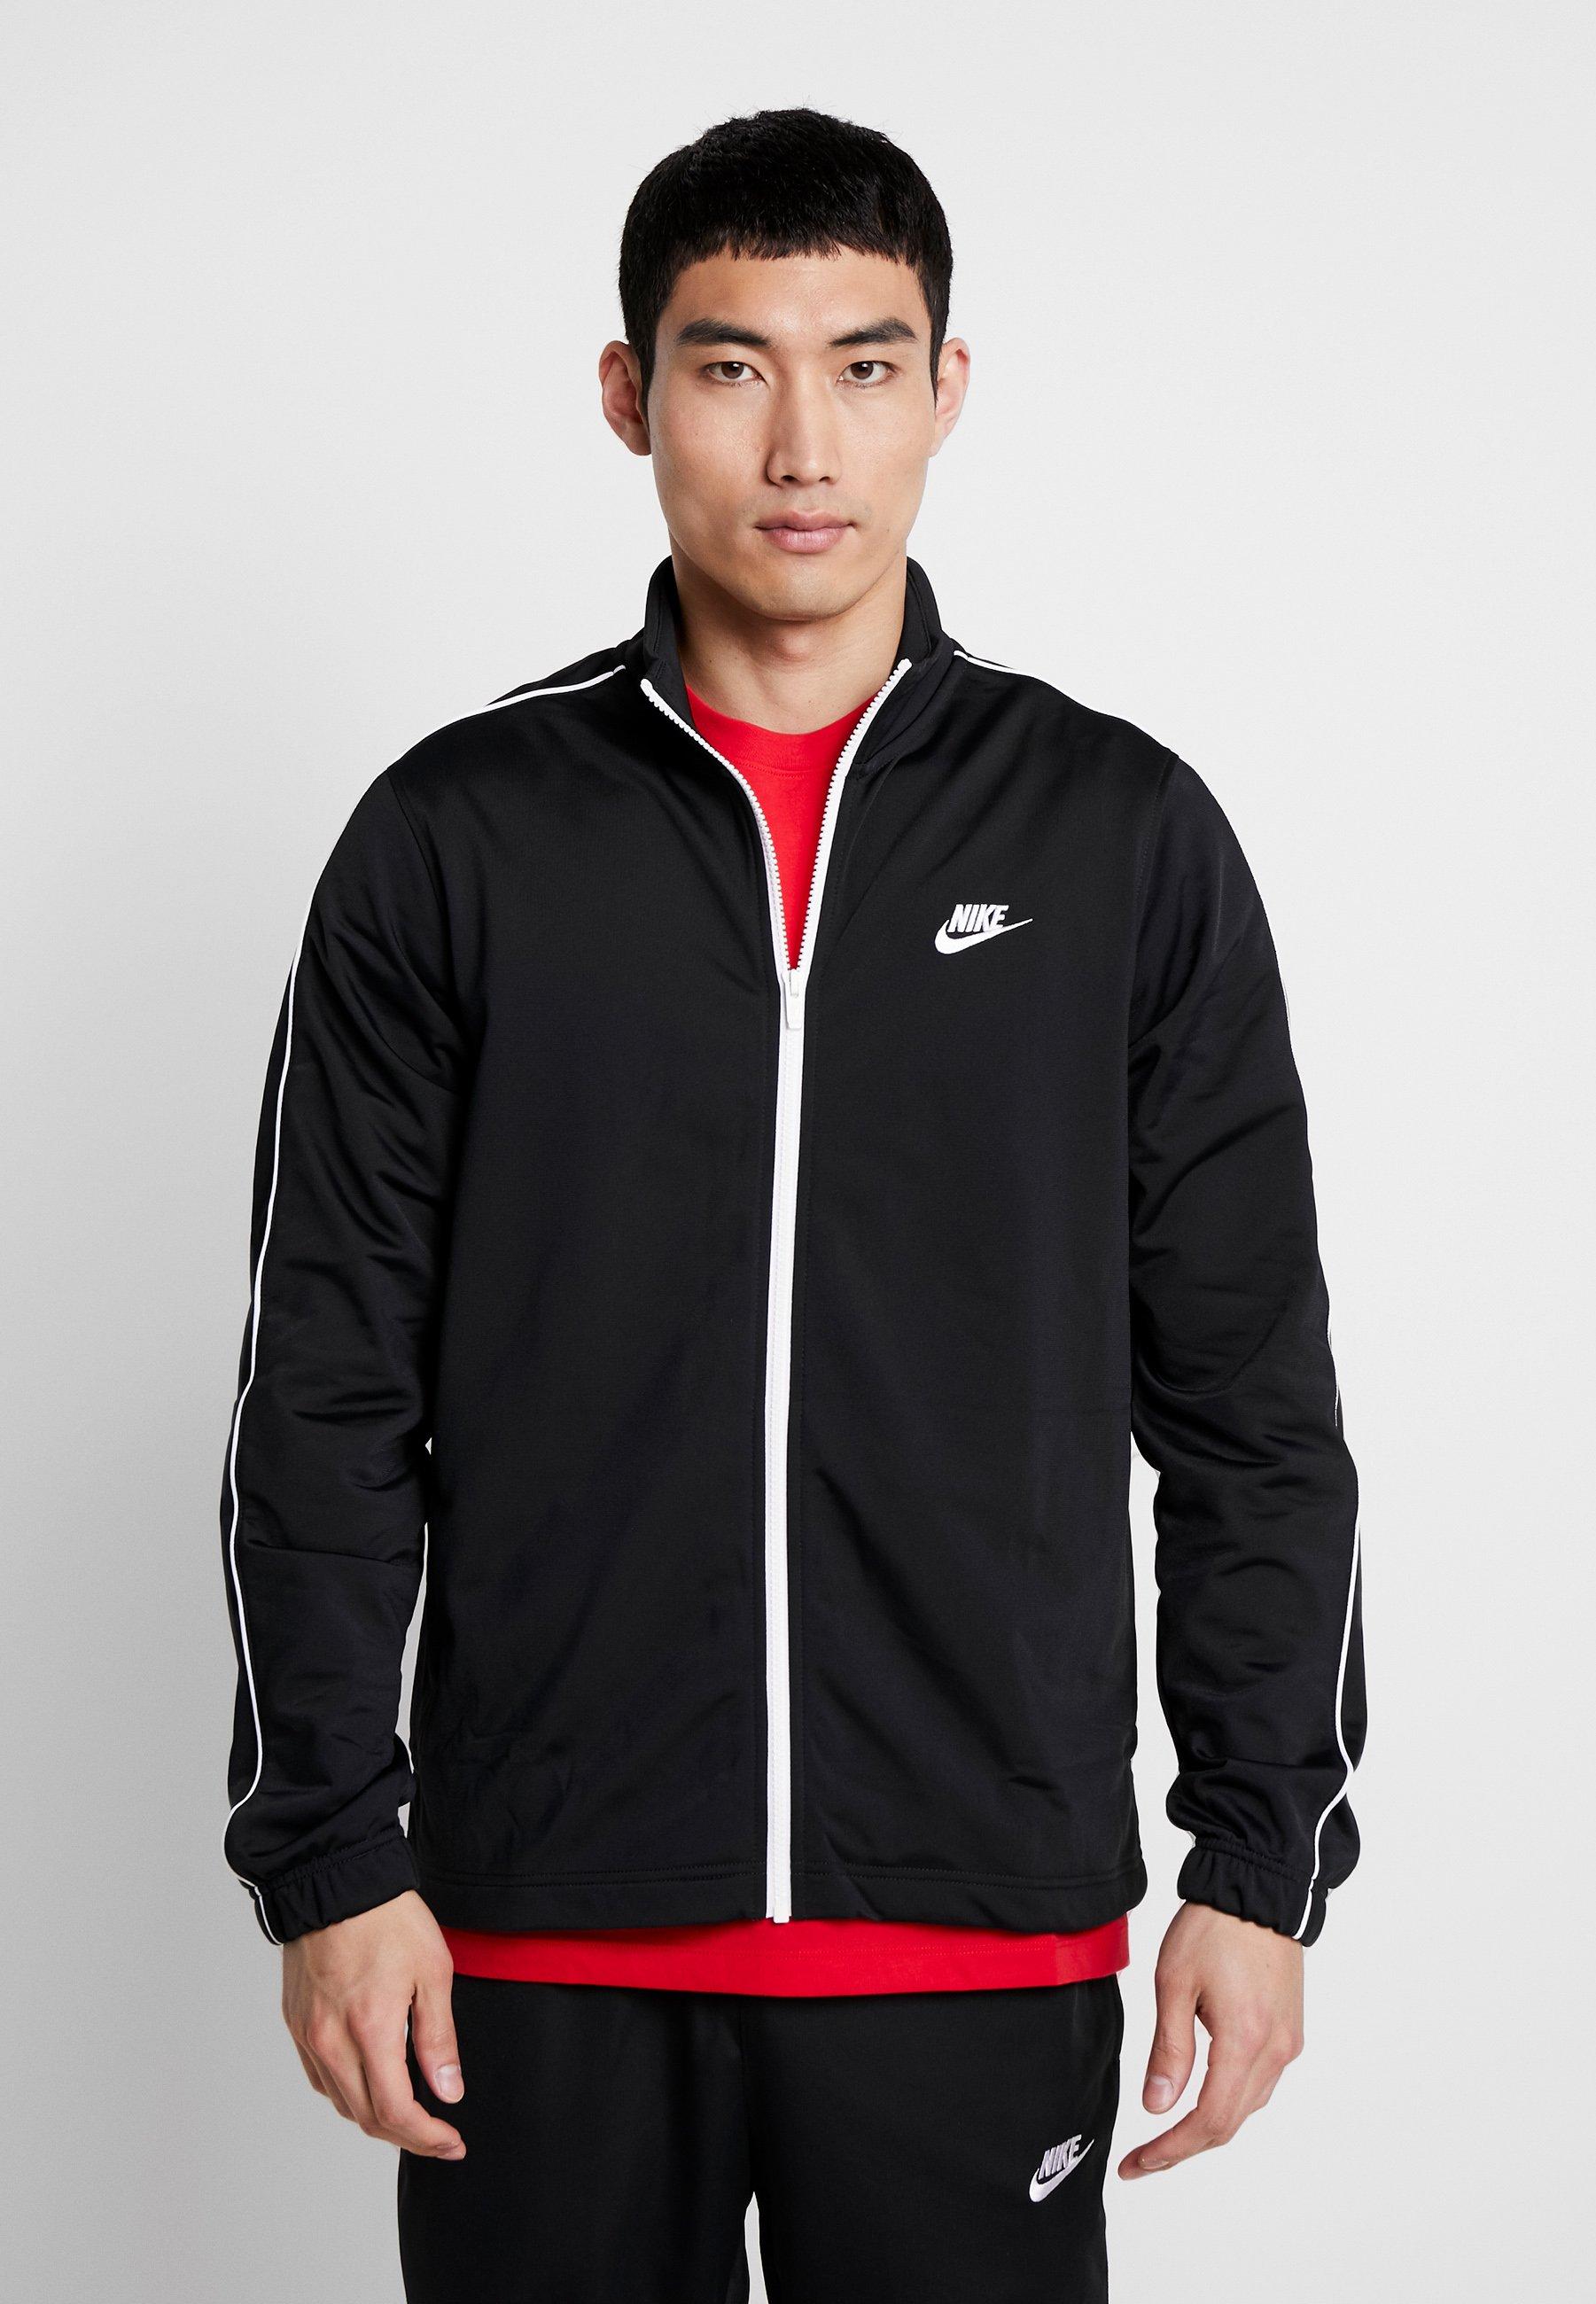 Nike Black BasicSurvêtement white Sportswear Suit bfYgy76v